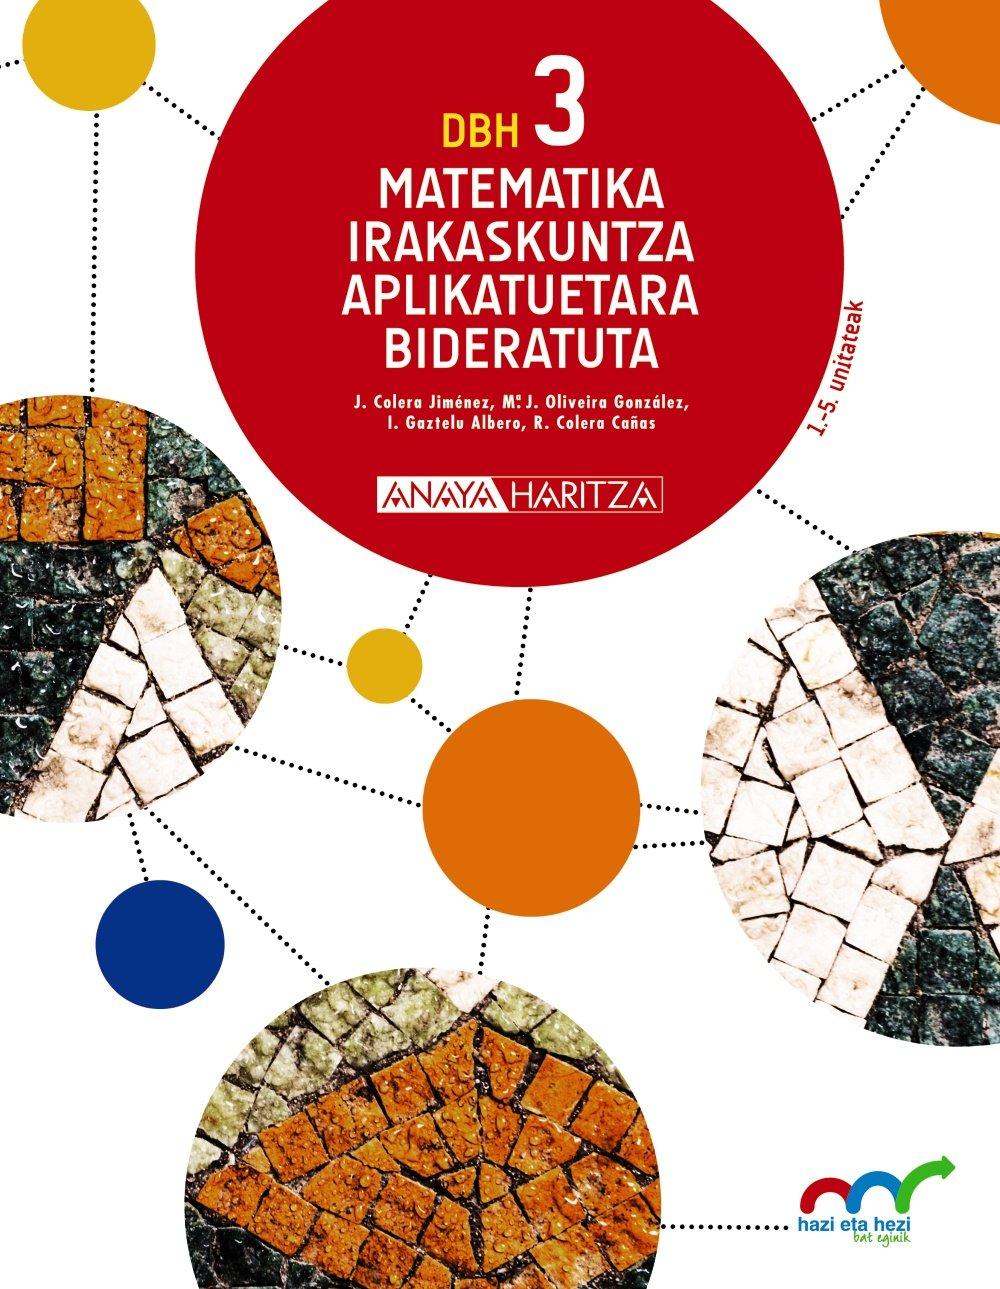 Download MATEMATIKA IRAKASK.APLIK.BIDERAT.3ºESO 16 P.VASCO ANAMAT33ES ebook